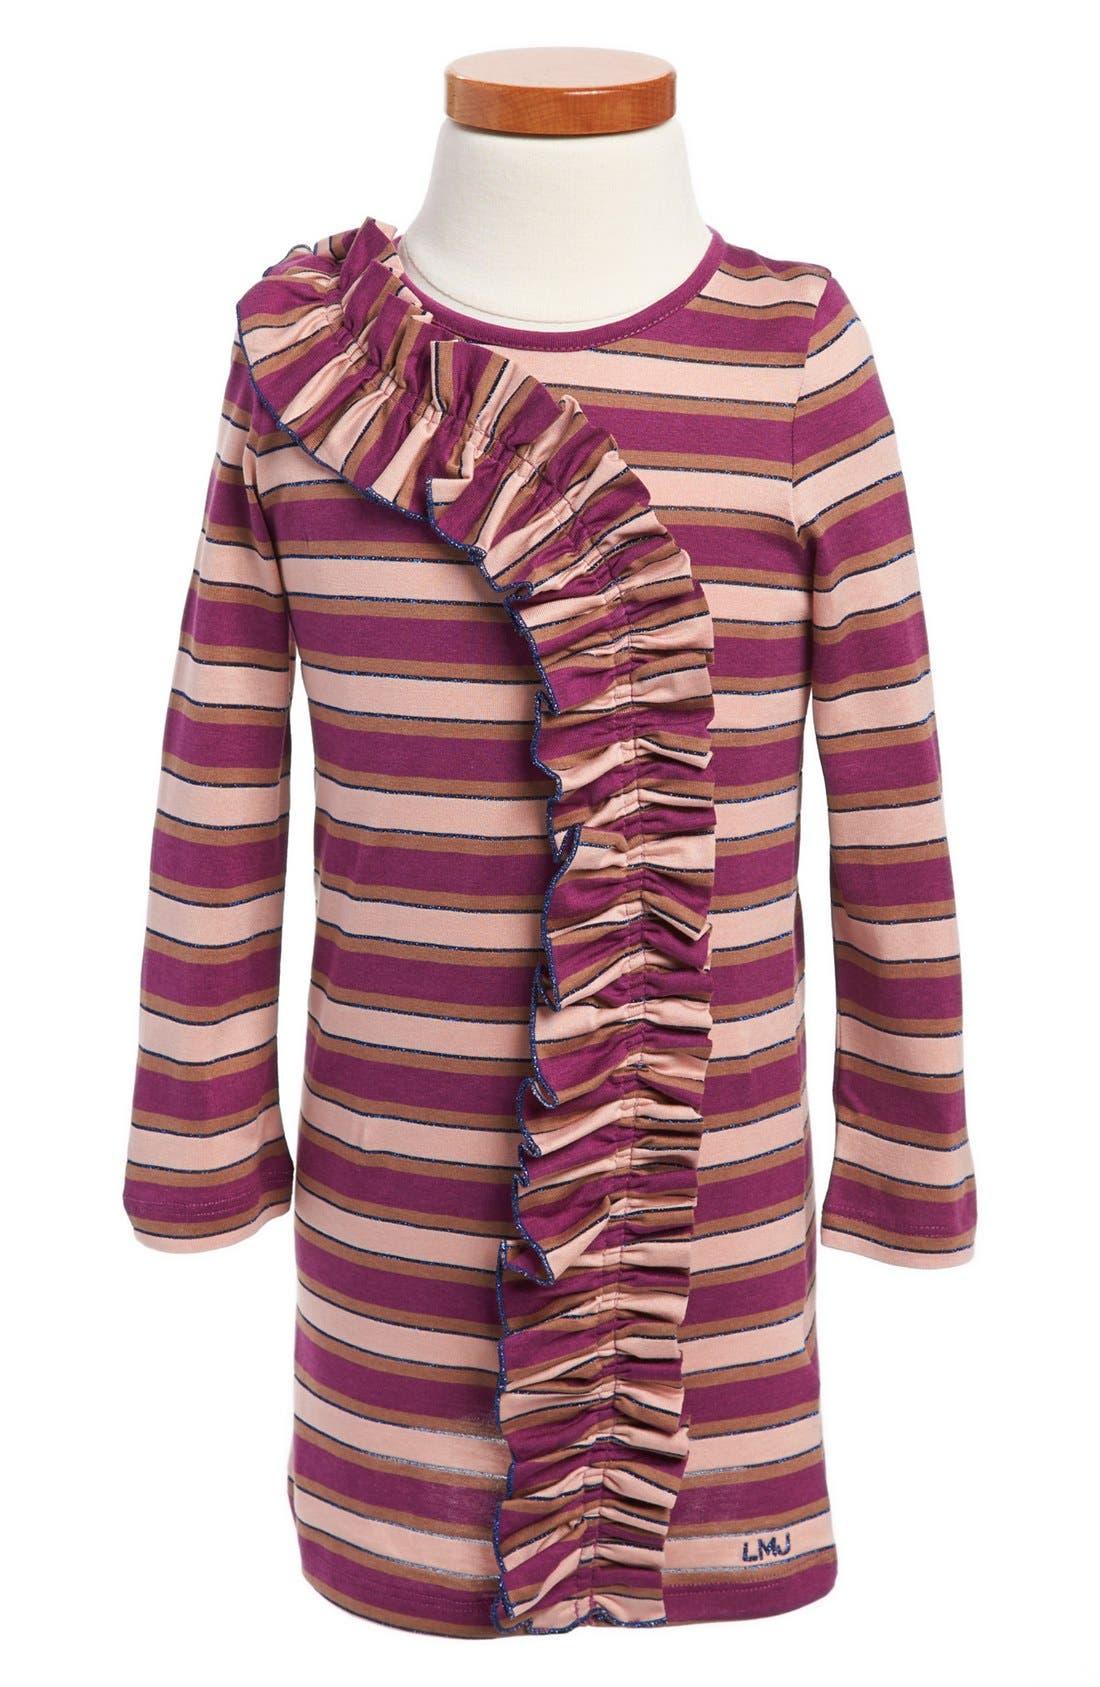 Alternate Image 1 Selected - LITTLE MARC JACOBS Long Sleeve Dress (Toddler Girls)